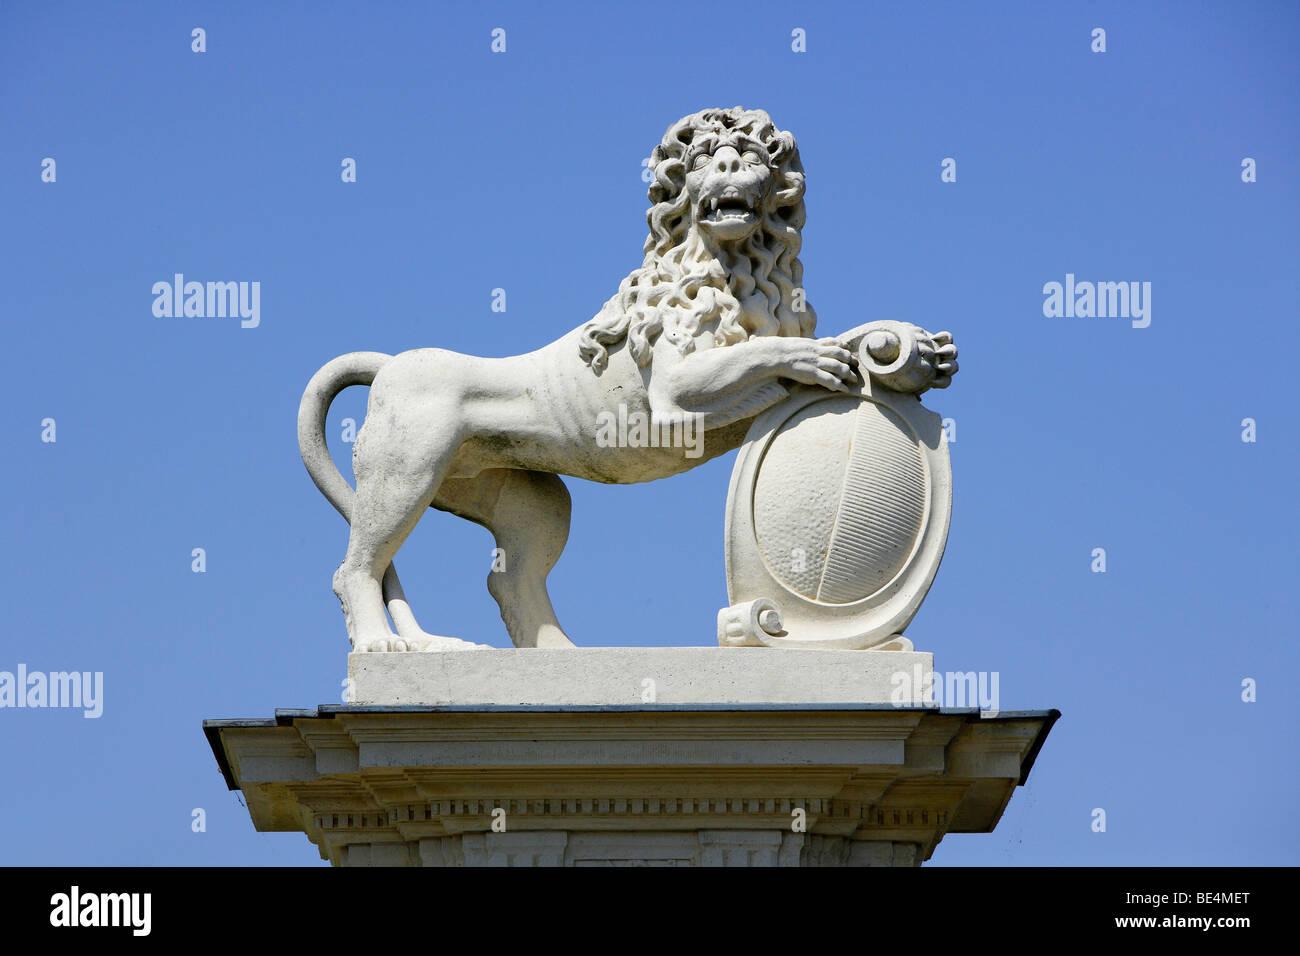 Lion sculpture, Donderberg Palace, Nordrhein-Westfalen, Germany, Europe Banque D'Images